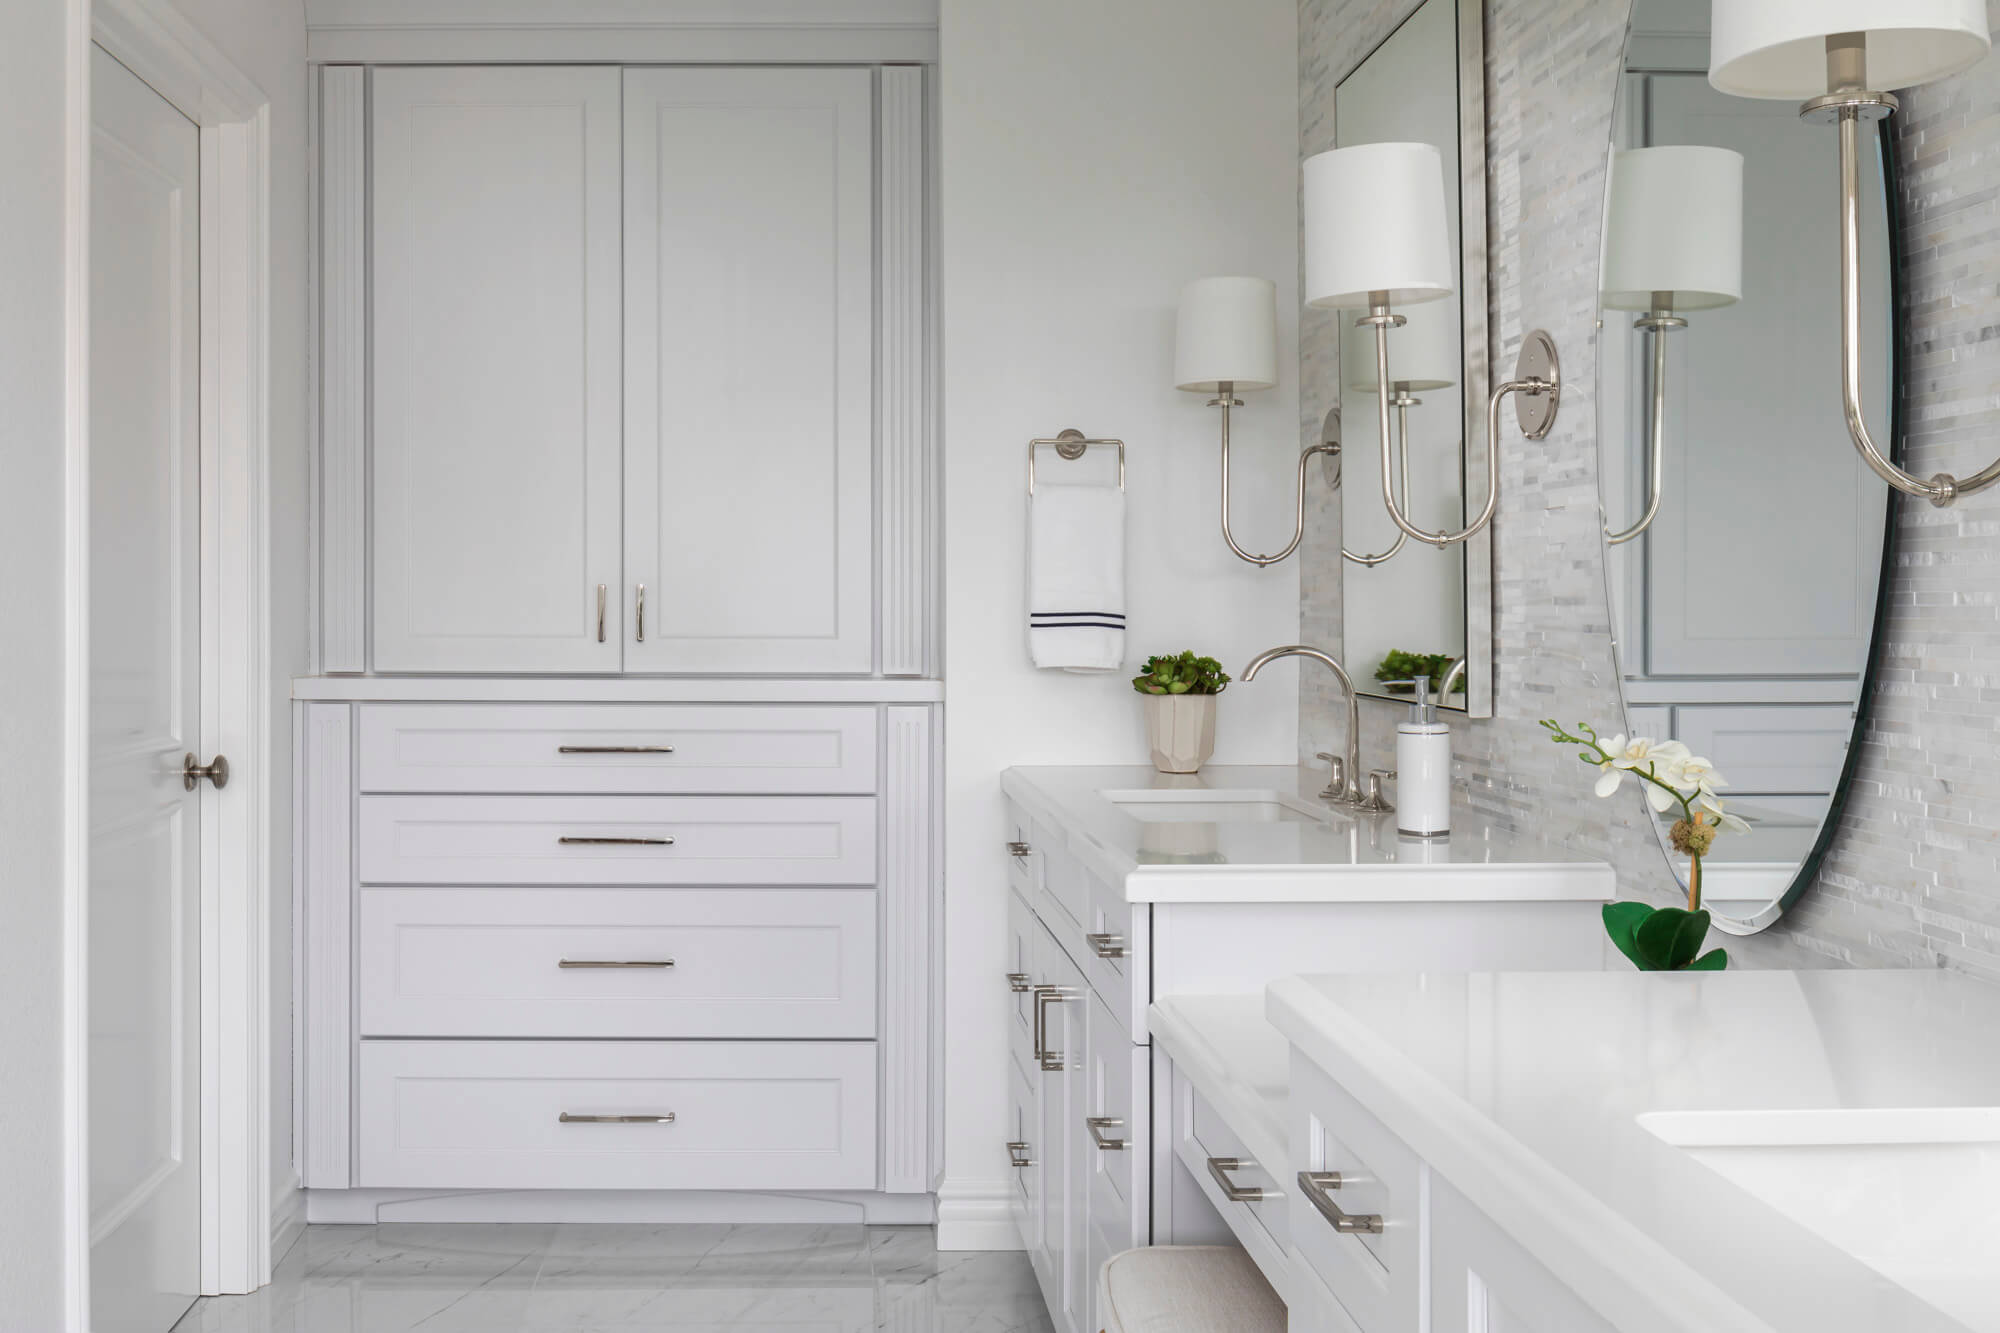 Master-Bath-Storage-Cabinets